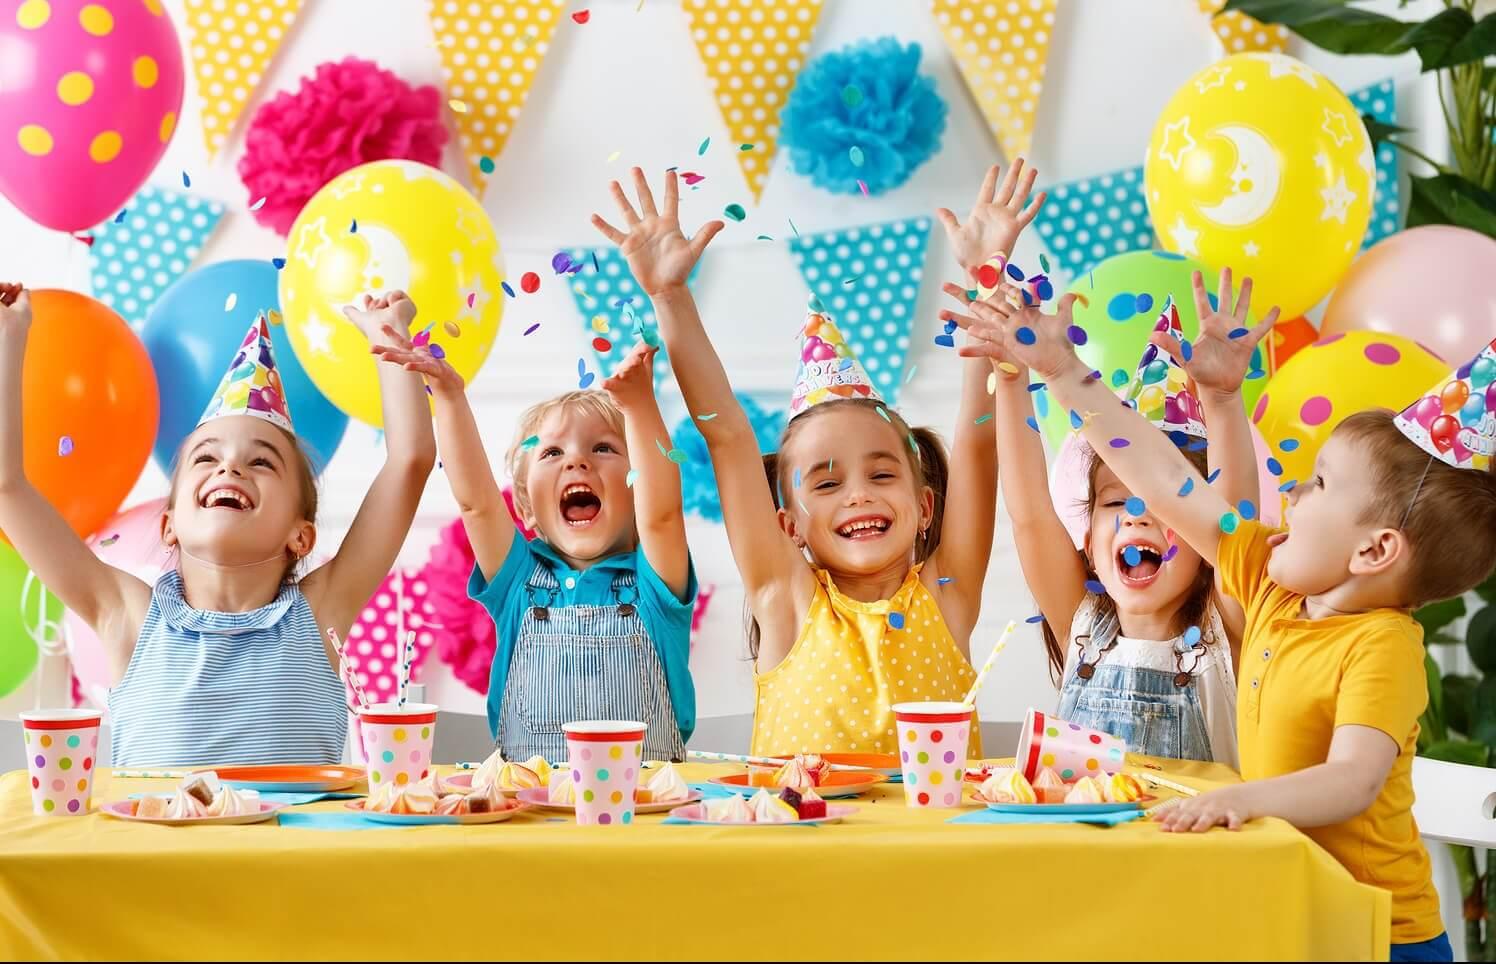 bigstock N s Birthday Happy Kids With 245634508 e1558777053541